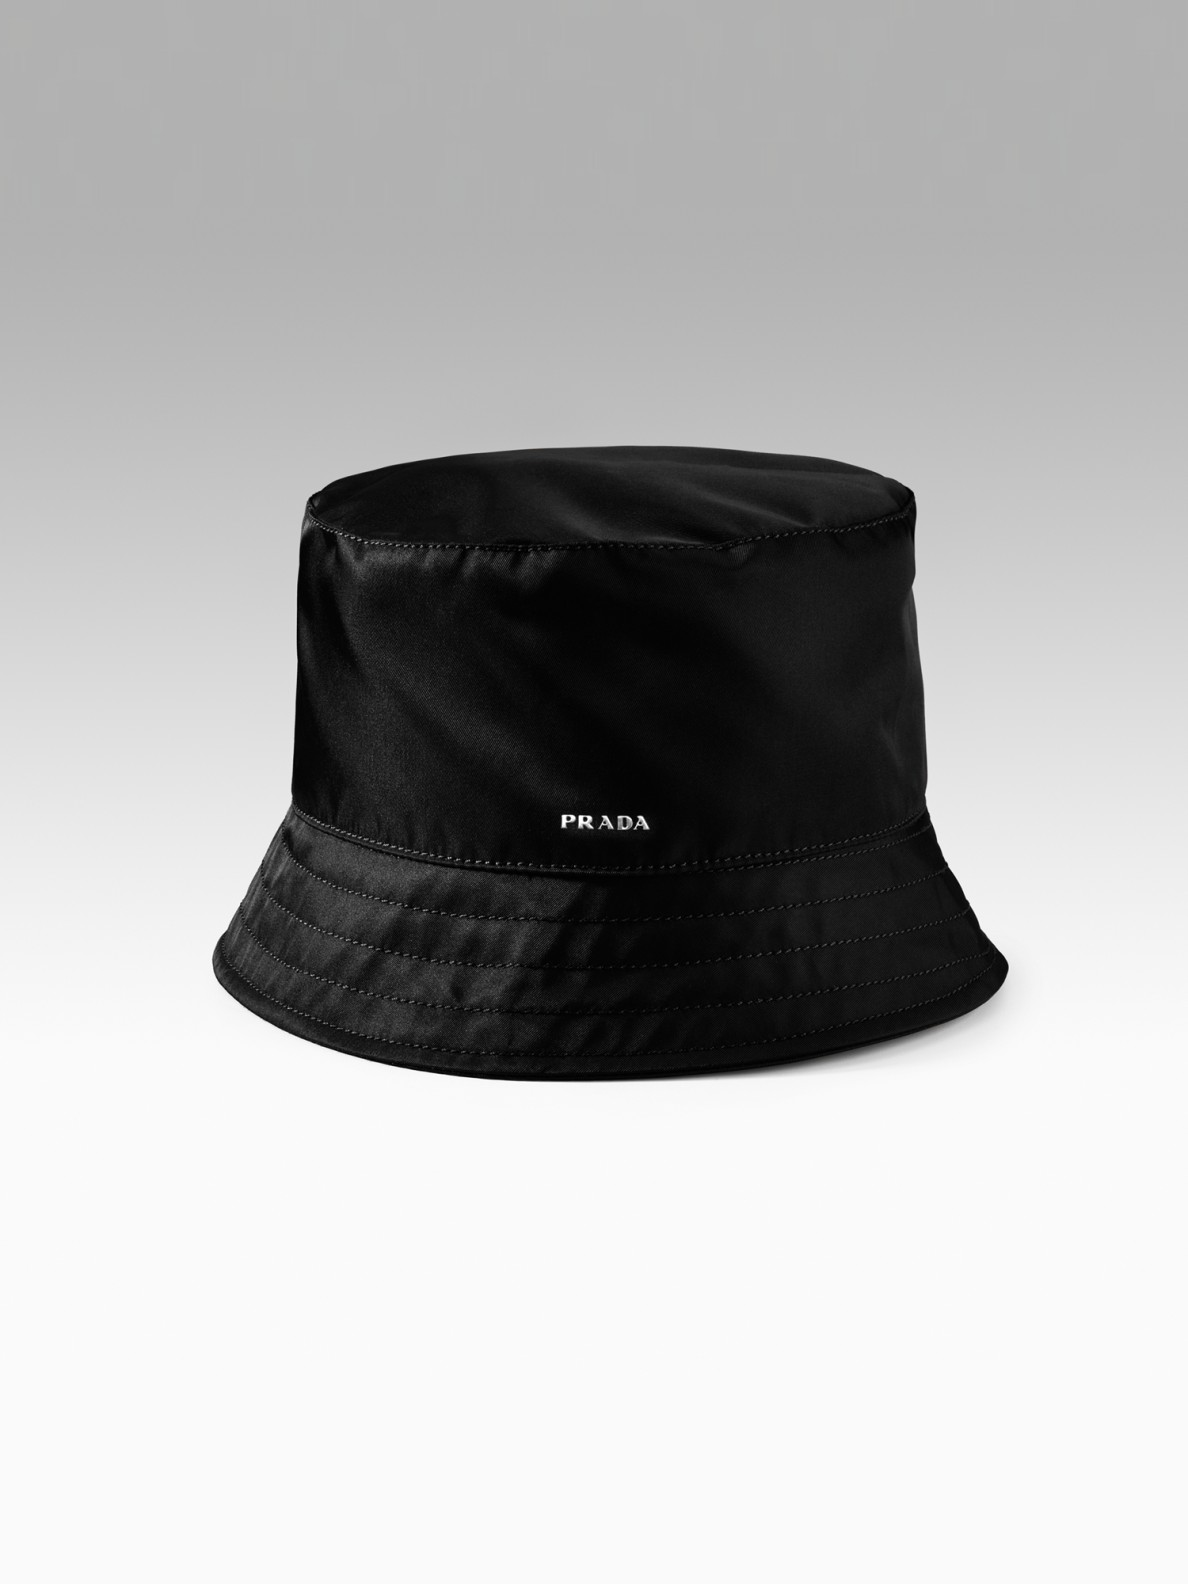 Prada Nylon Bucket Hat In Black For Men Lyst